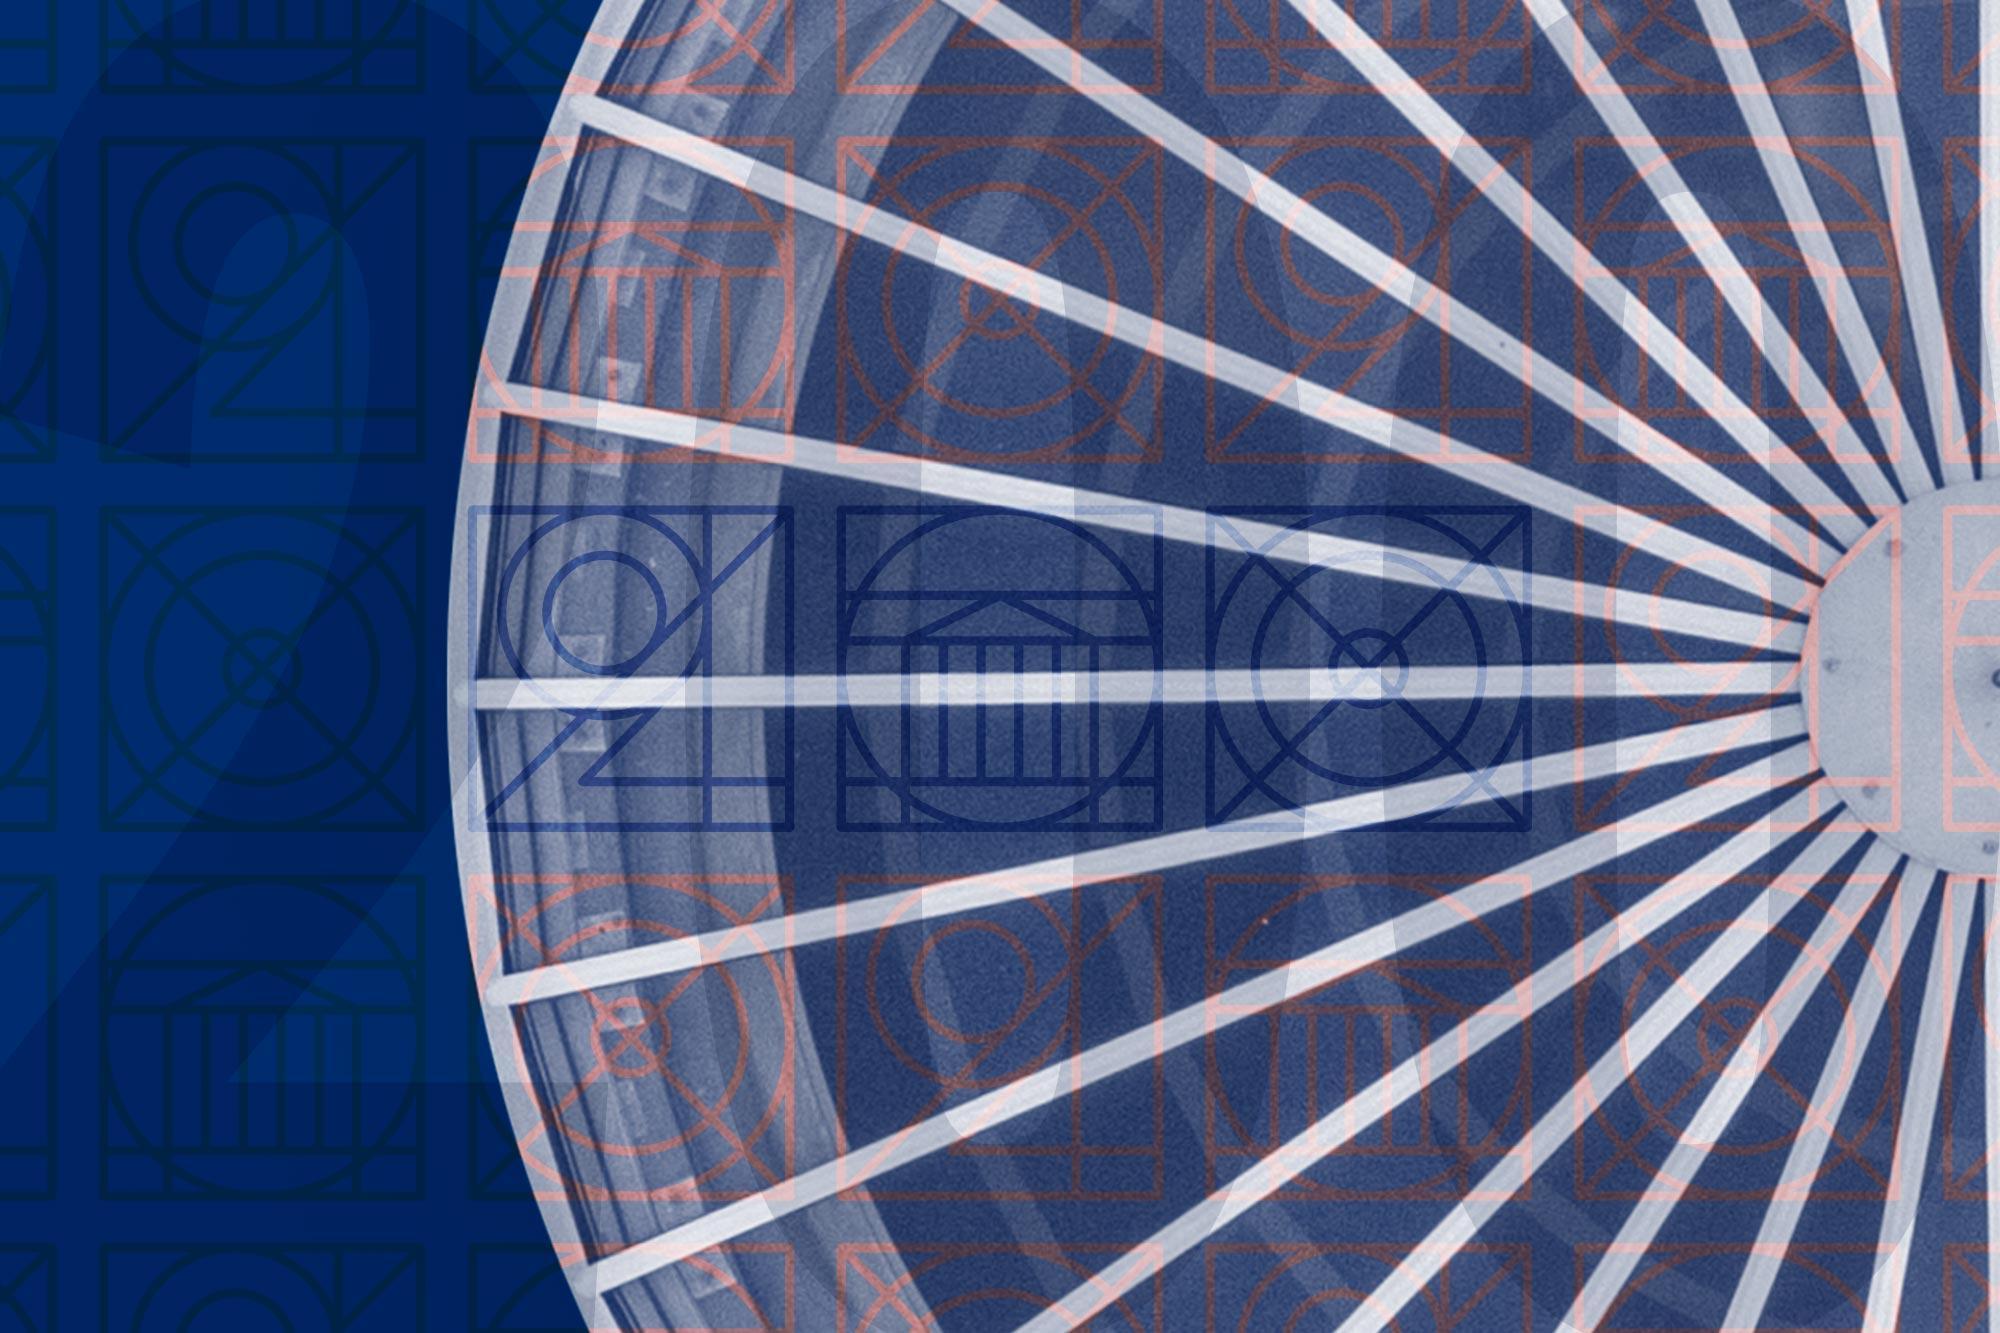 UVA bicentennial design